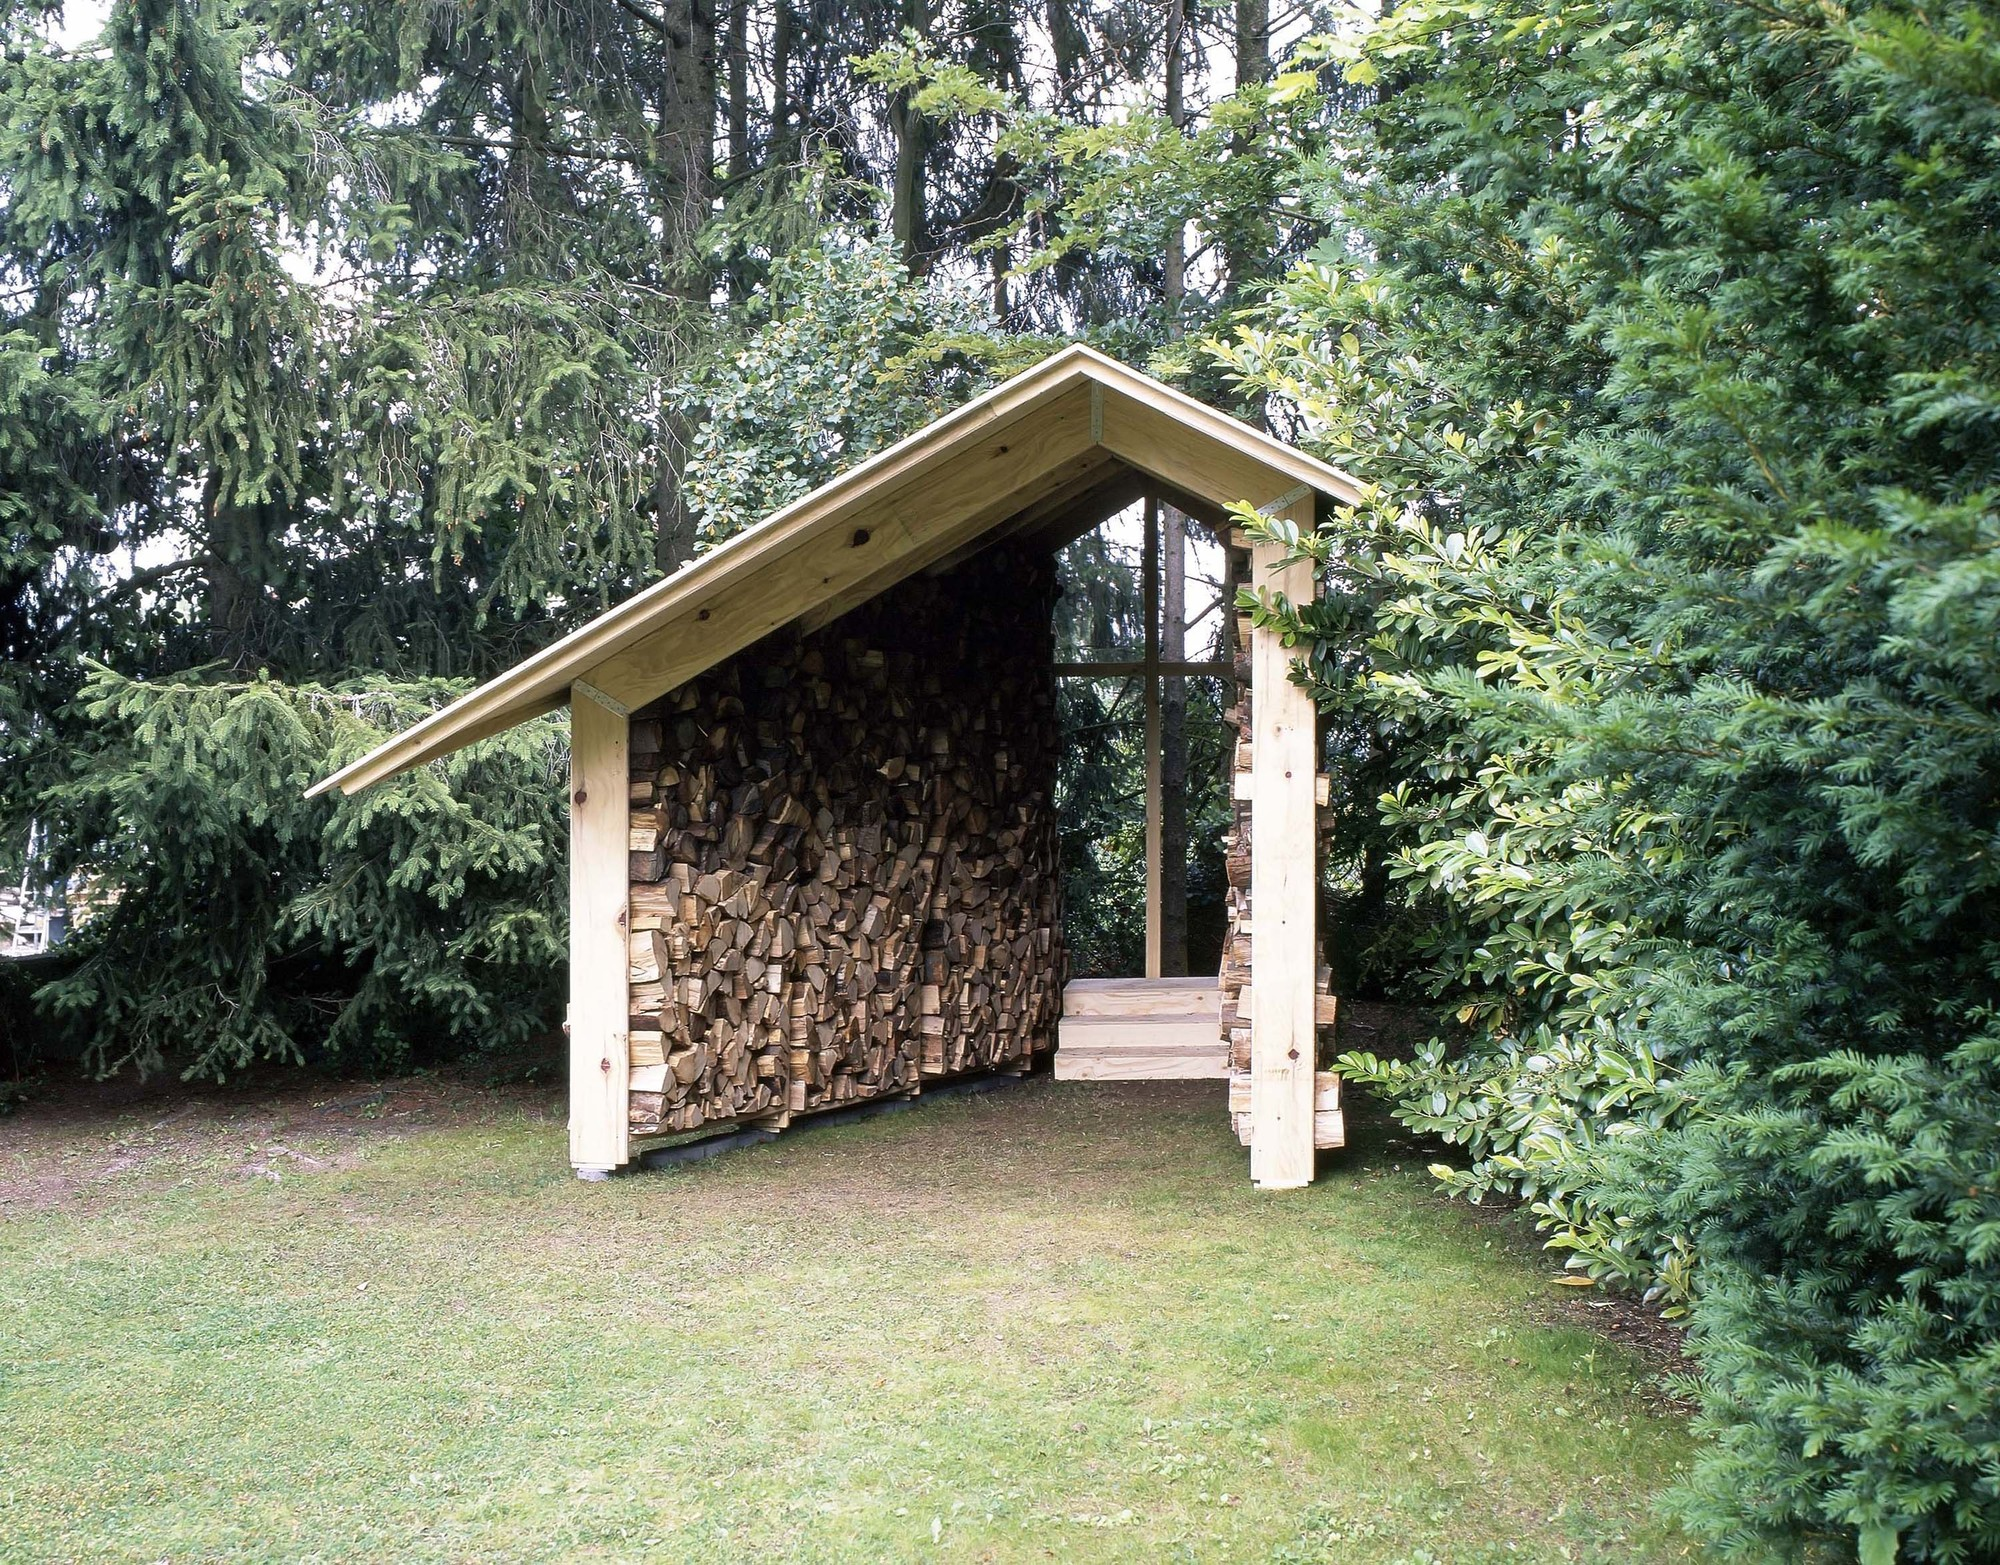 Wooden Hut / Kawahara Krause Architects, Courtesy of Kawahara Krause Architects